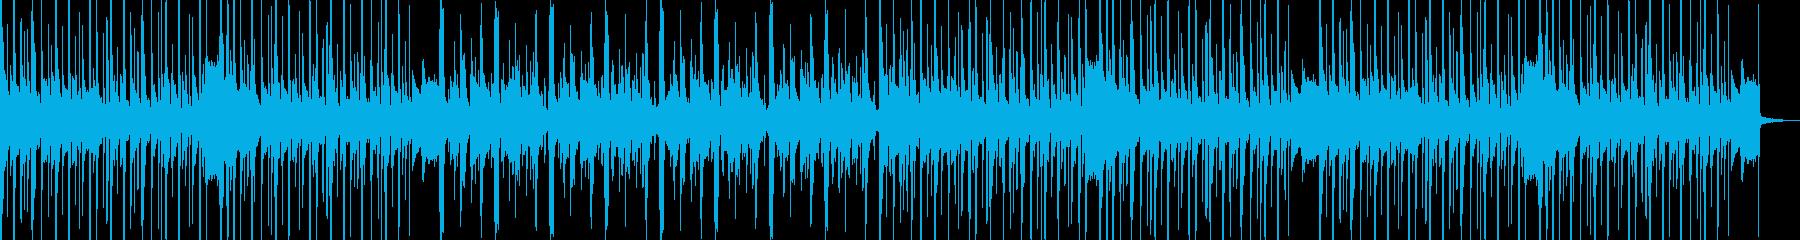 【CM】未来的なディープアブストラクトの再生済みの波形